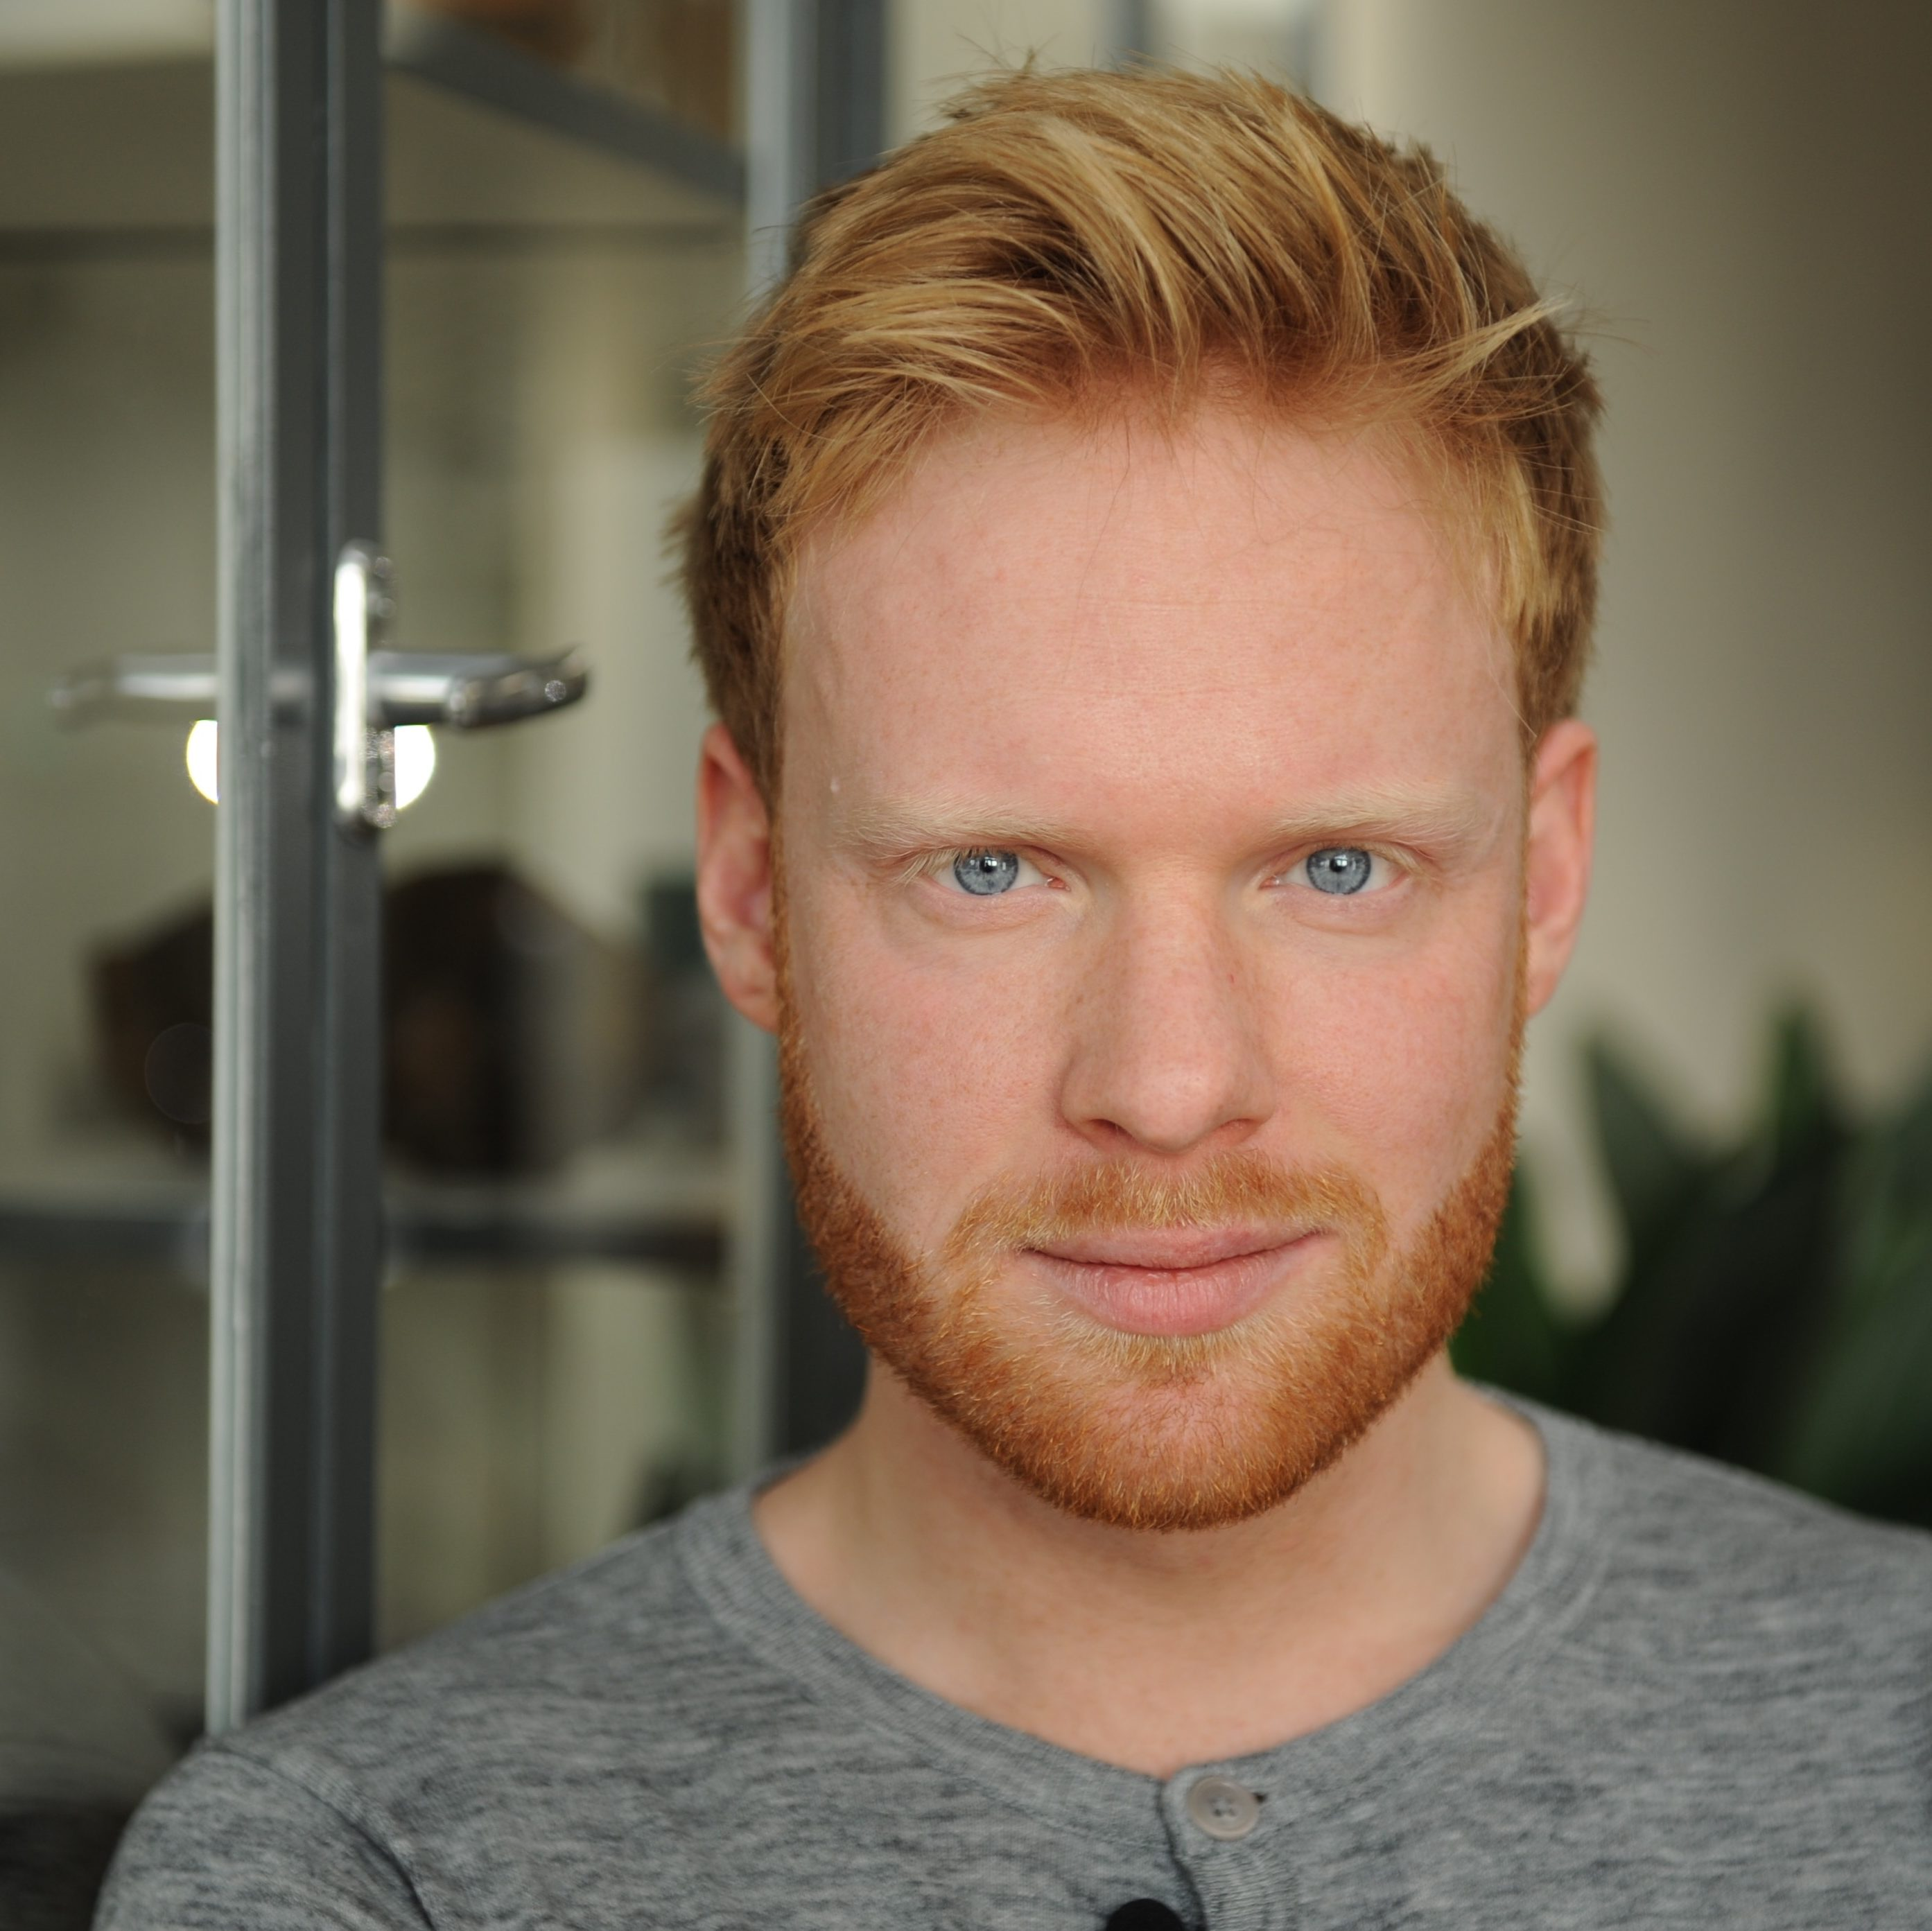 Eric Sweder